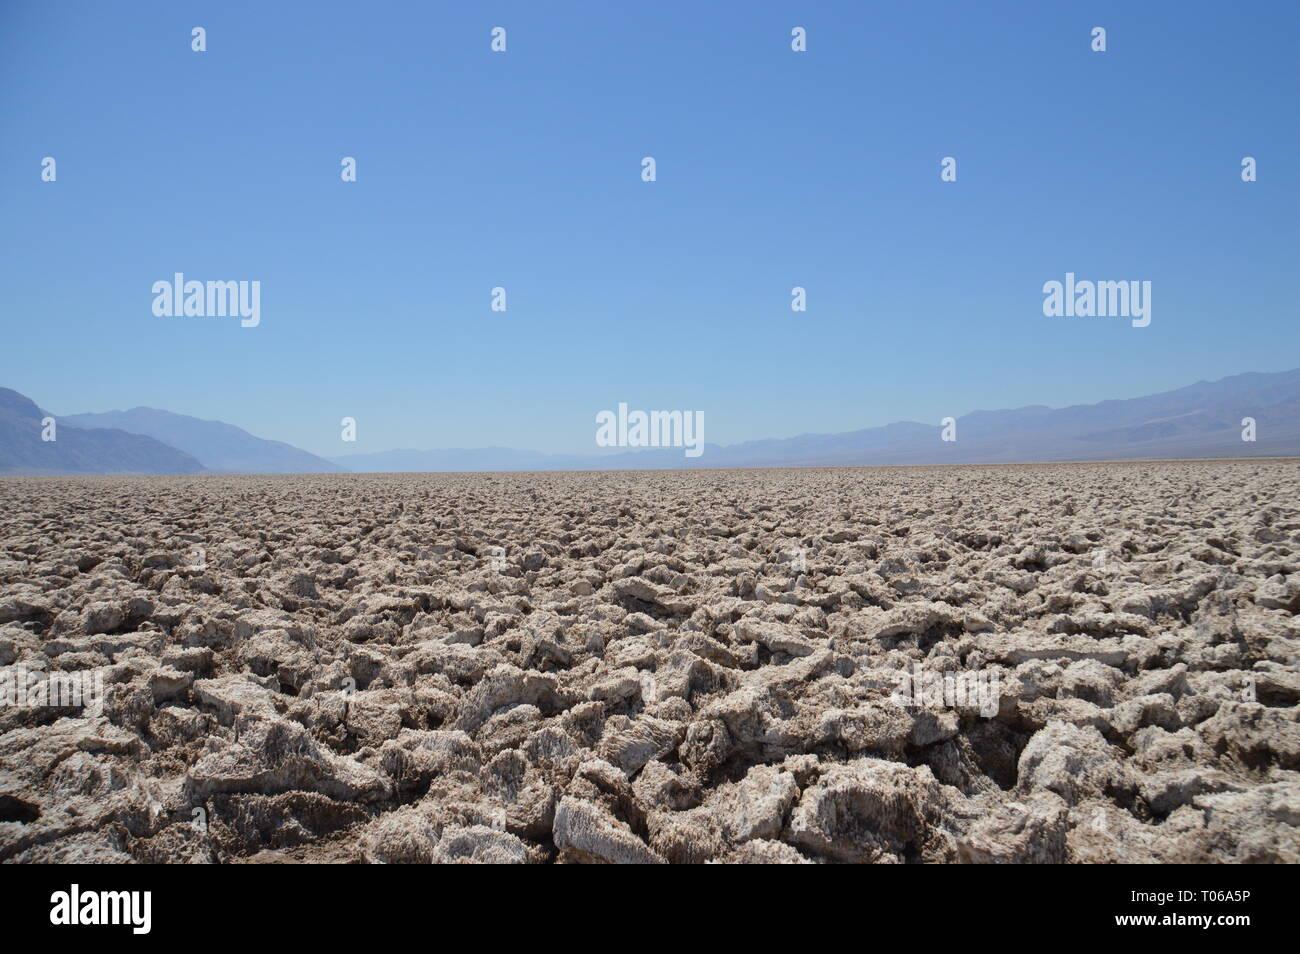 salty desert in Death Valley - Stock Image